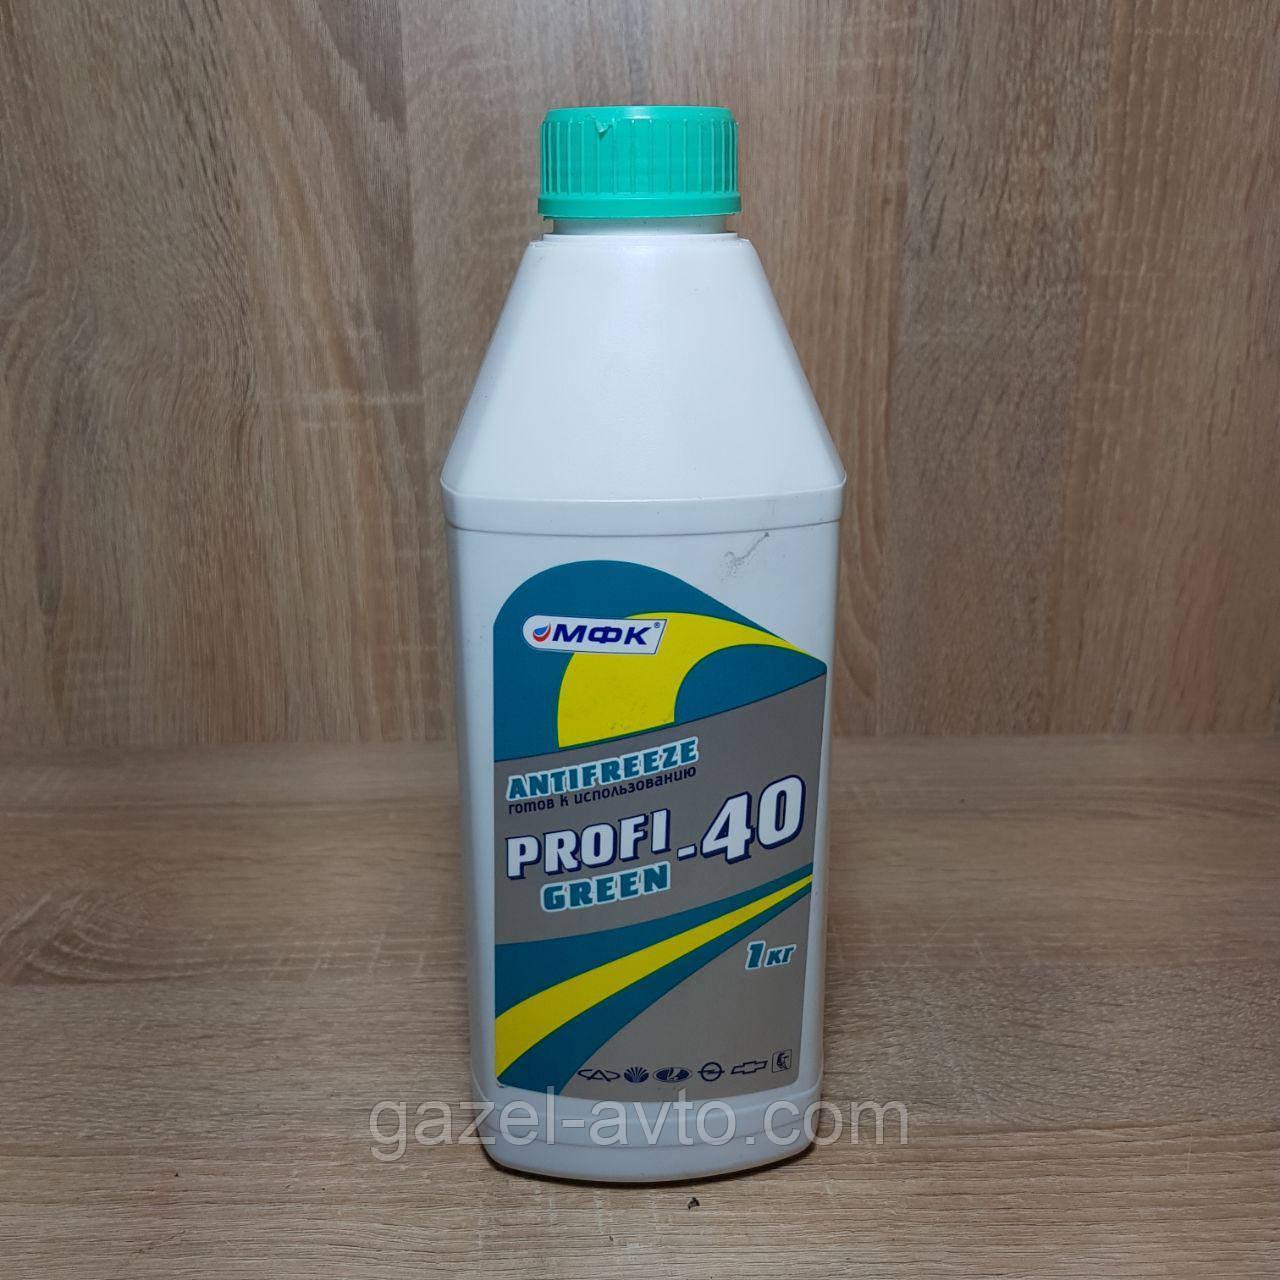 PROFI Антифриз GREEN-40, 0,9 кг